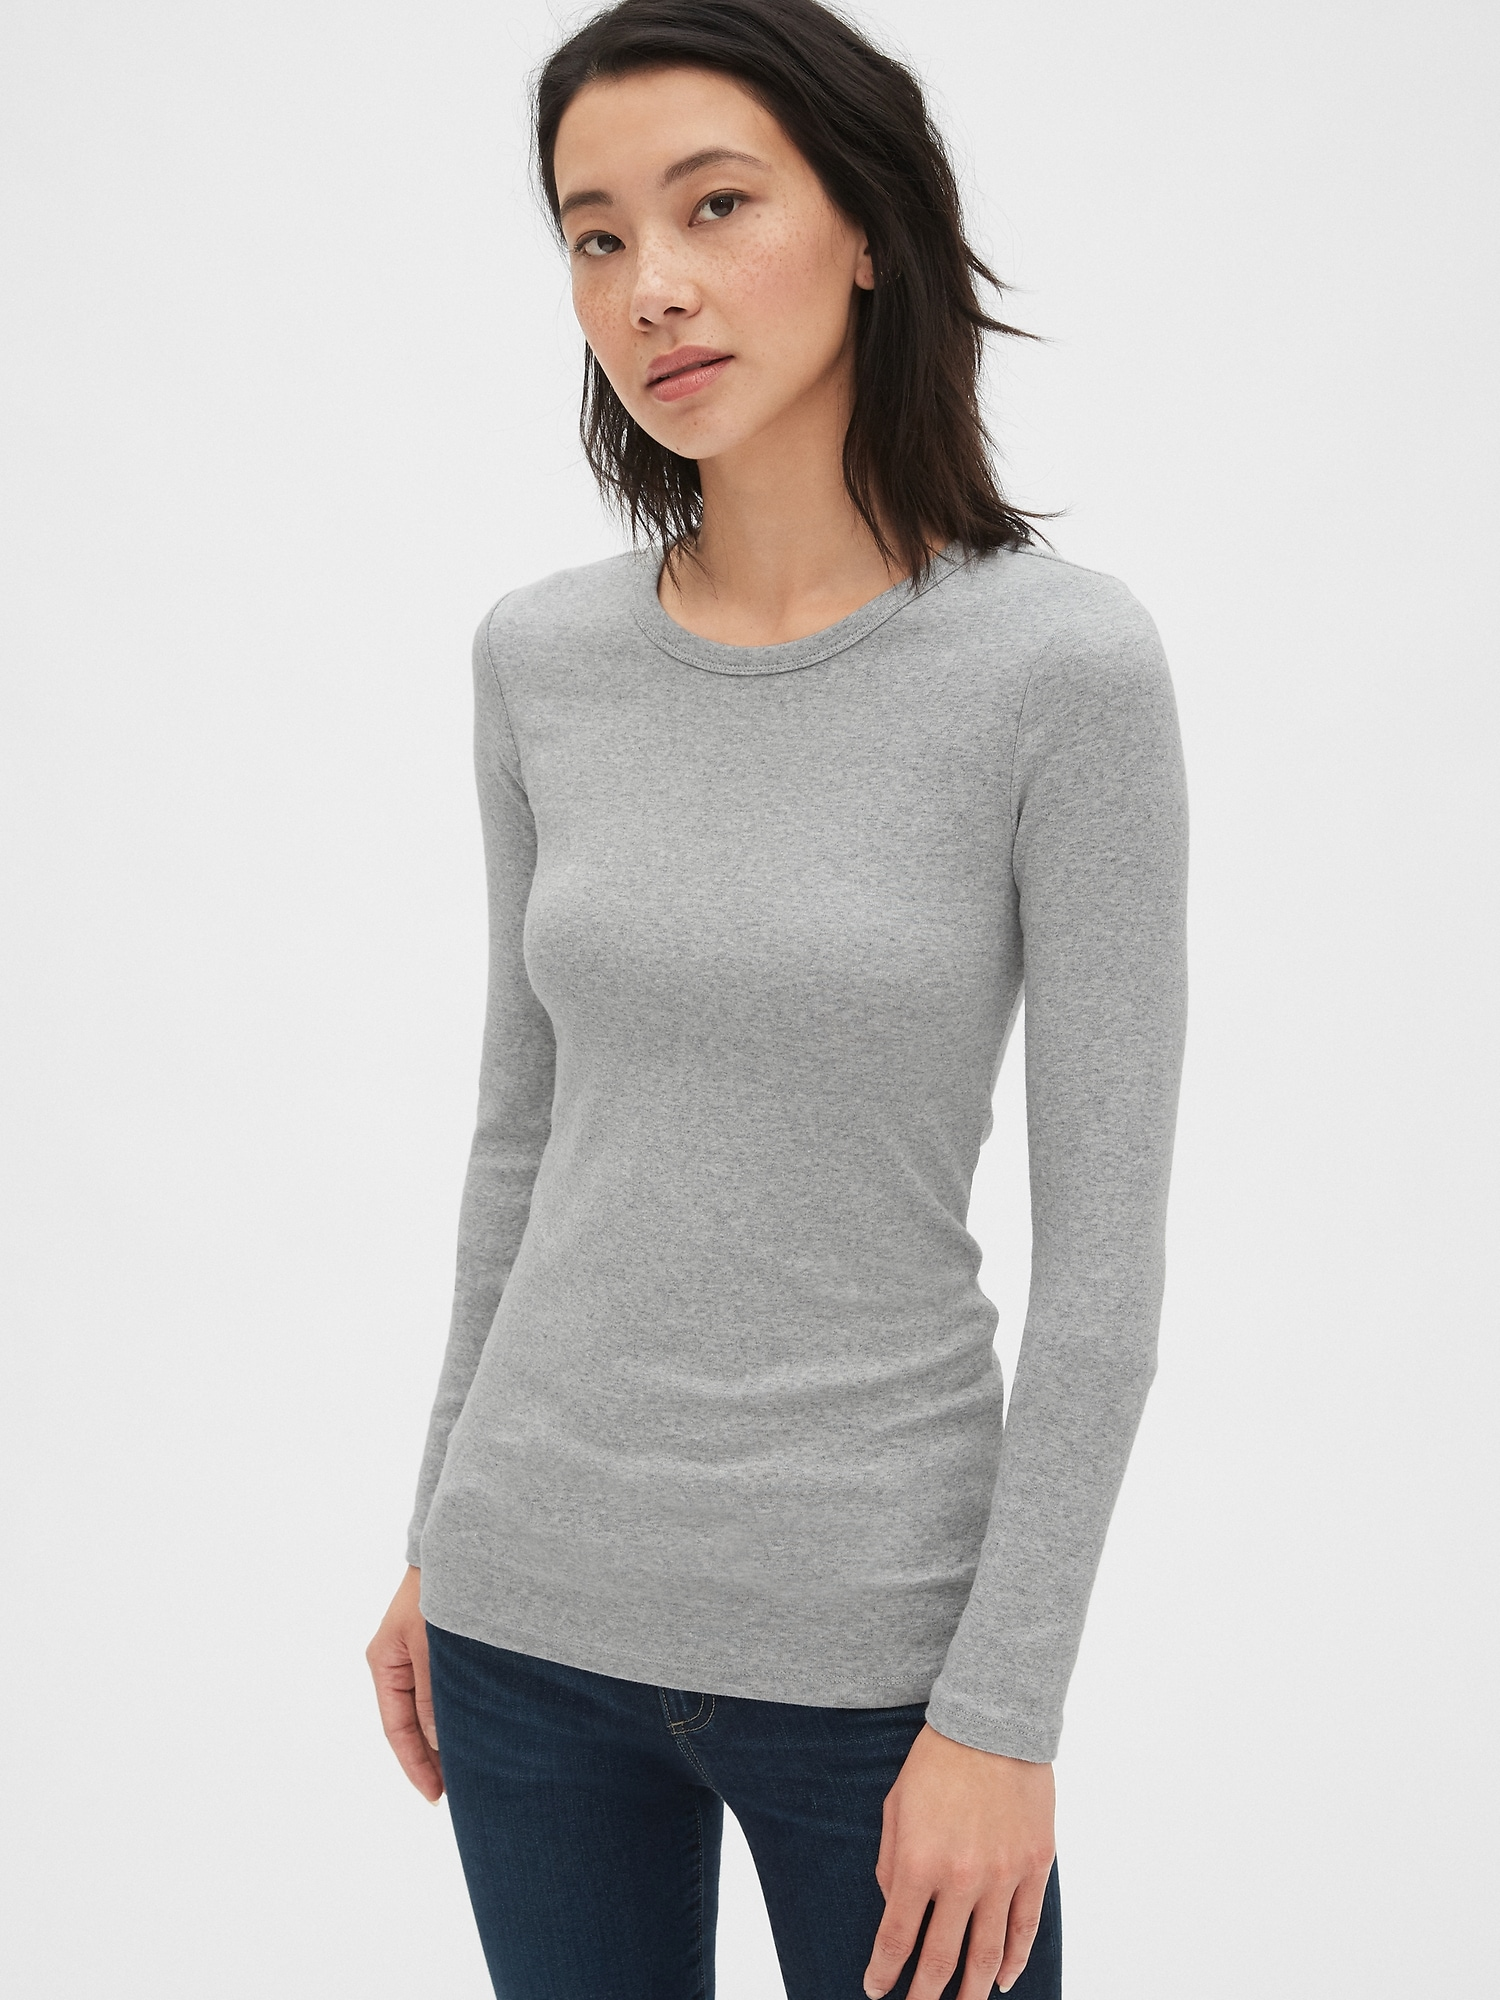 232d8588ef52 Modern Long Sleeve Crewneck T-Shirt | Gap